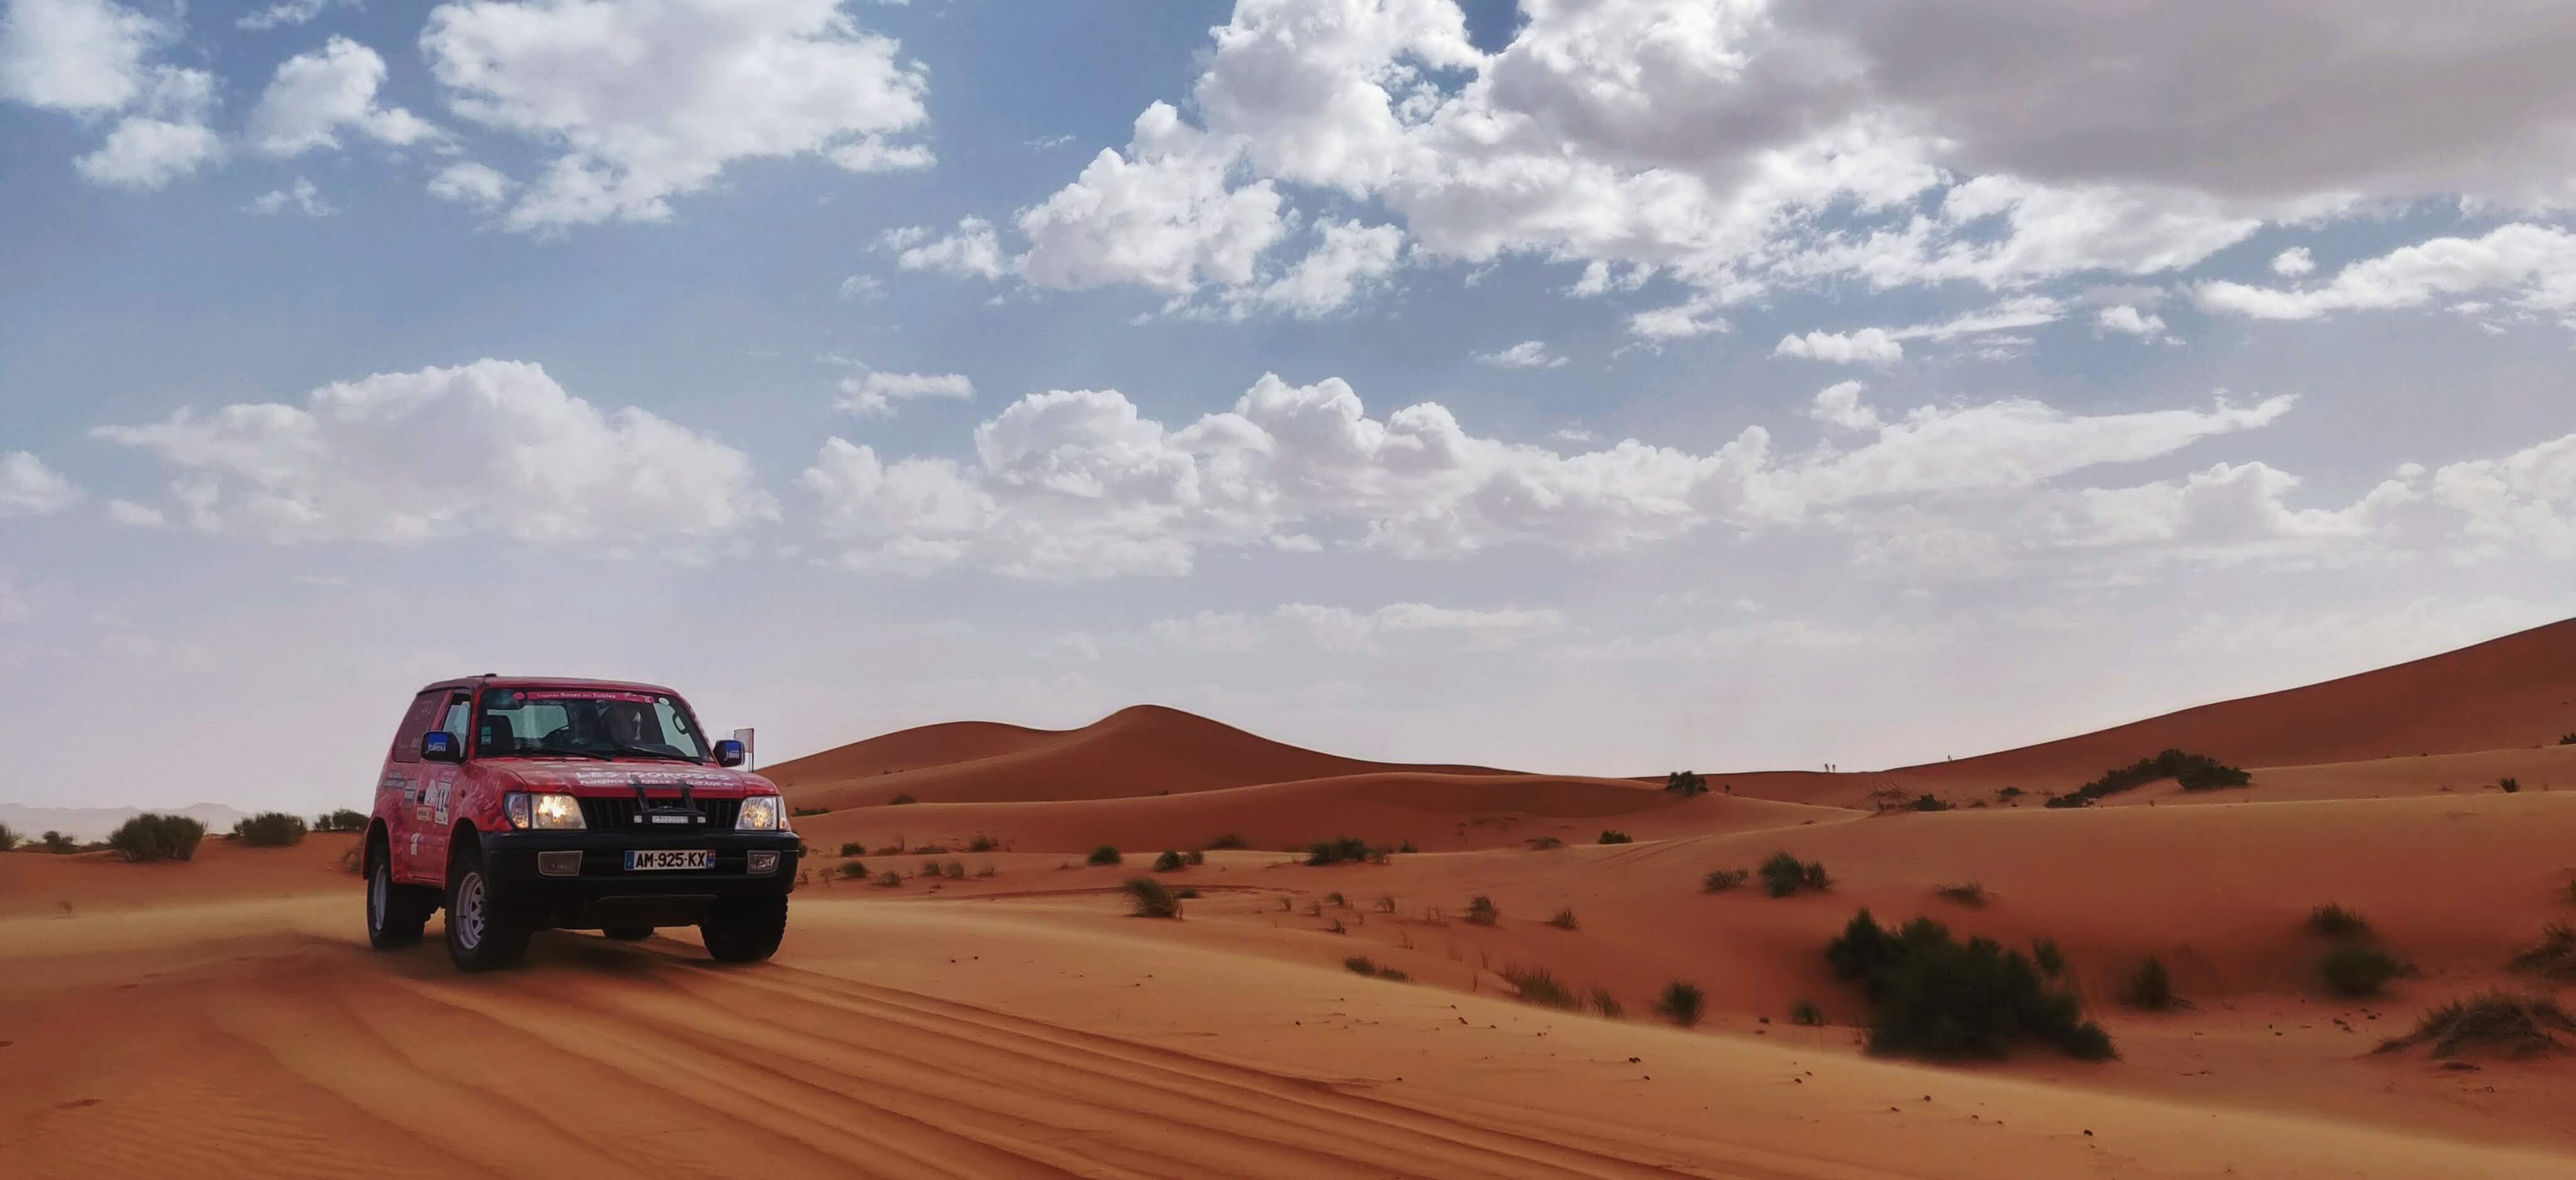 location 4X4 rallye Roses des sables